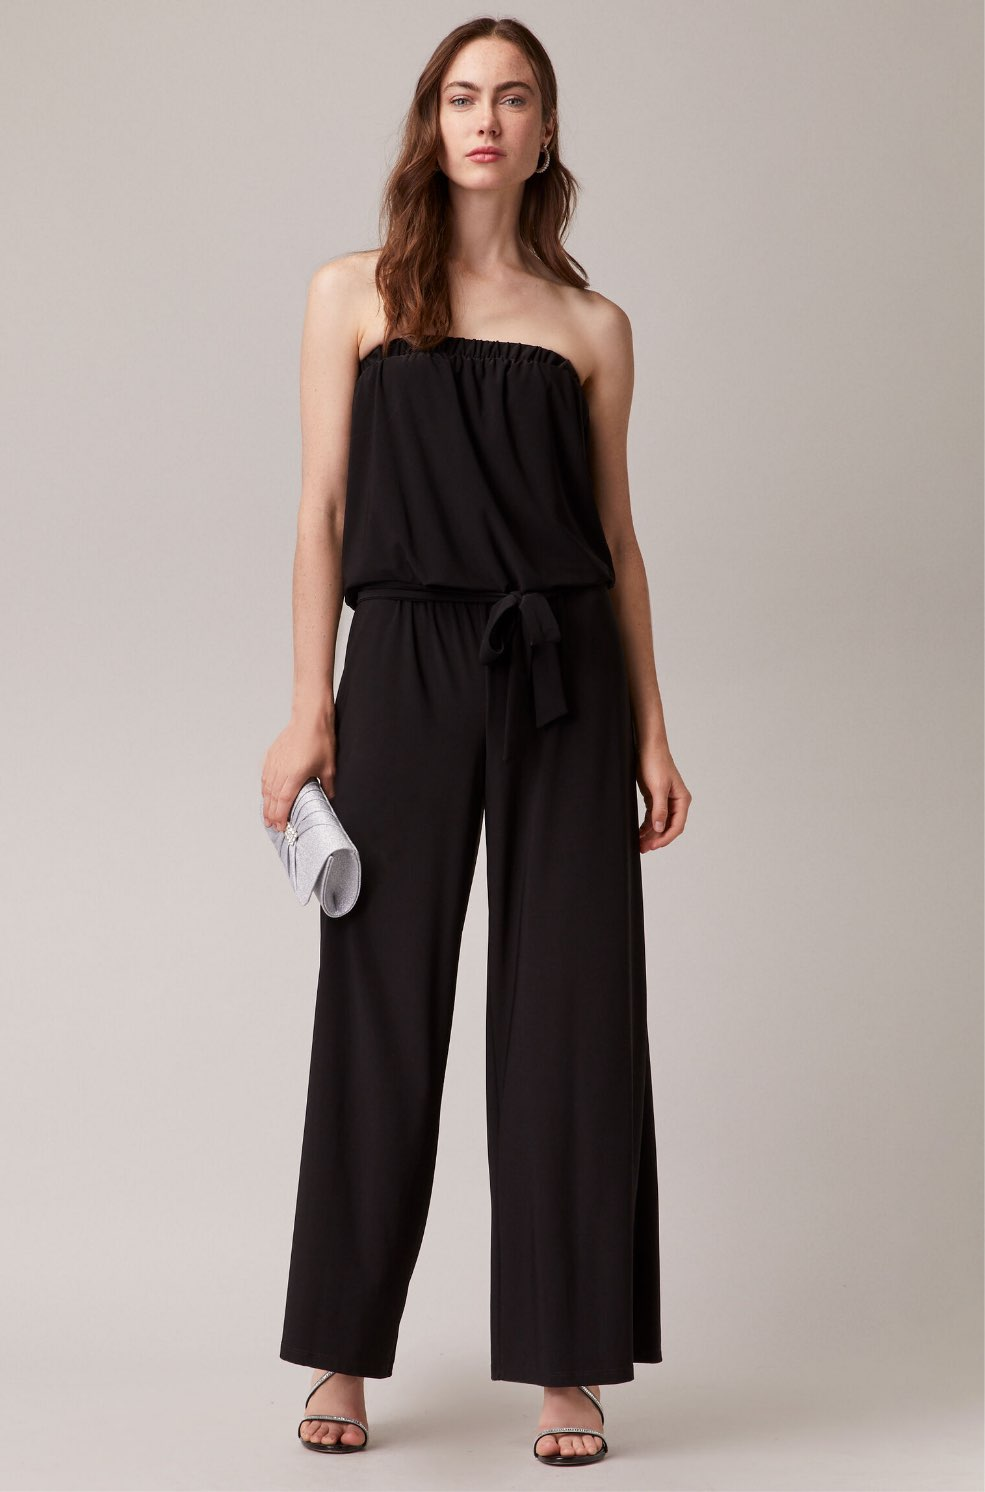 Melanie Lyne Women S Clothing Suits Dresses Accessories